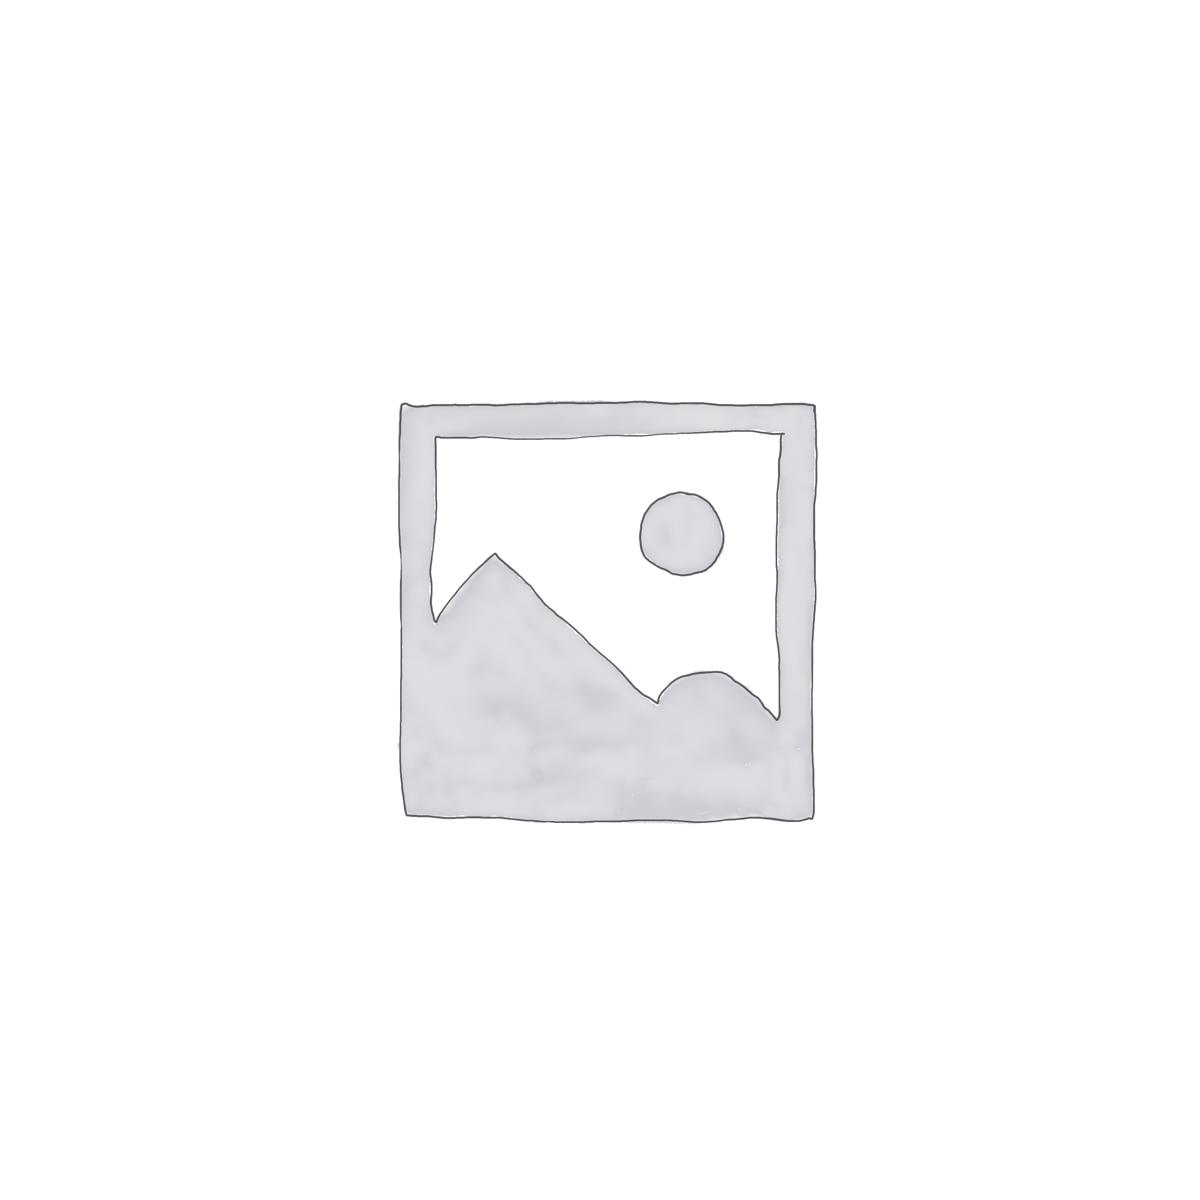 Foggy Mountains Landscape Wallpaper Mural